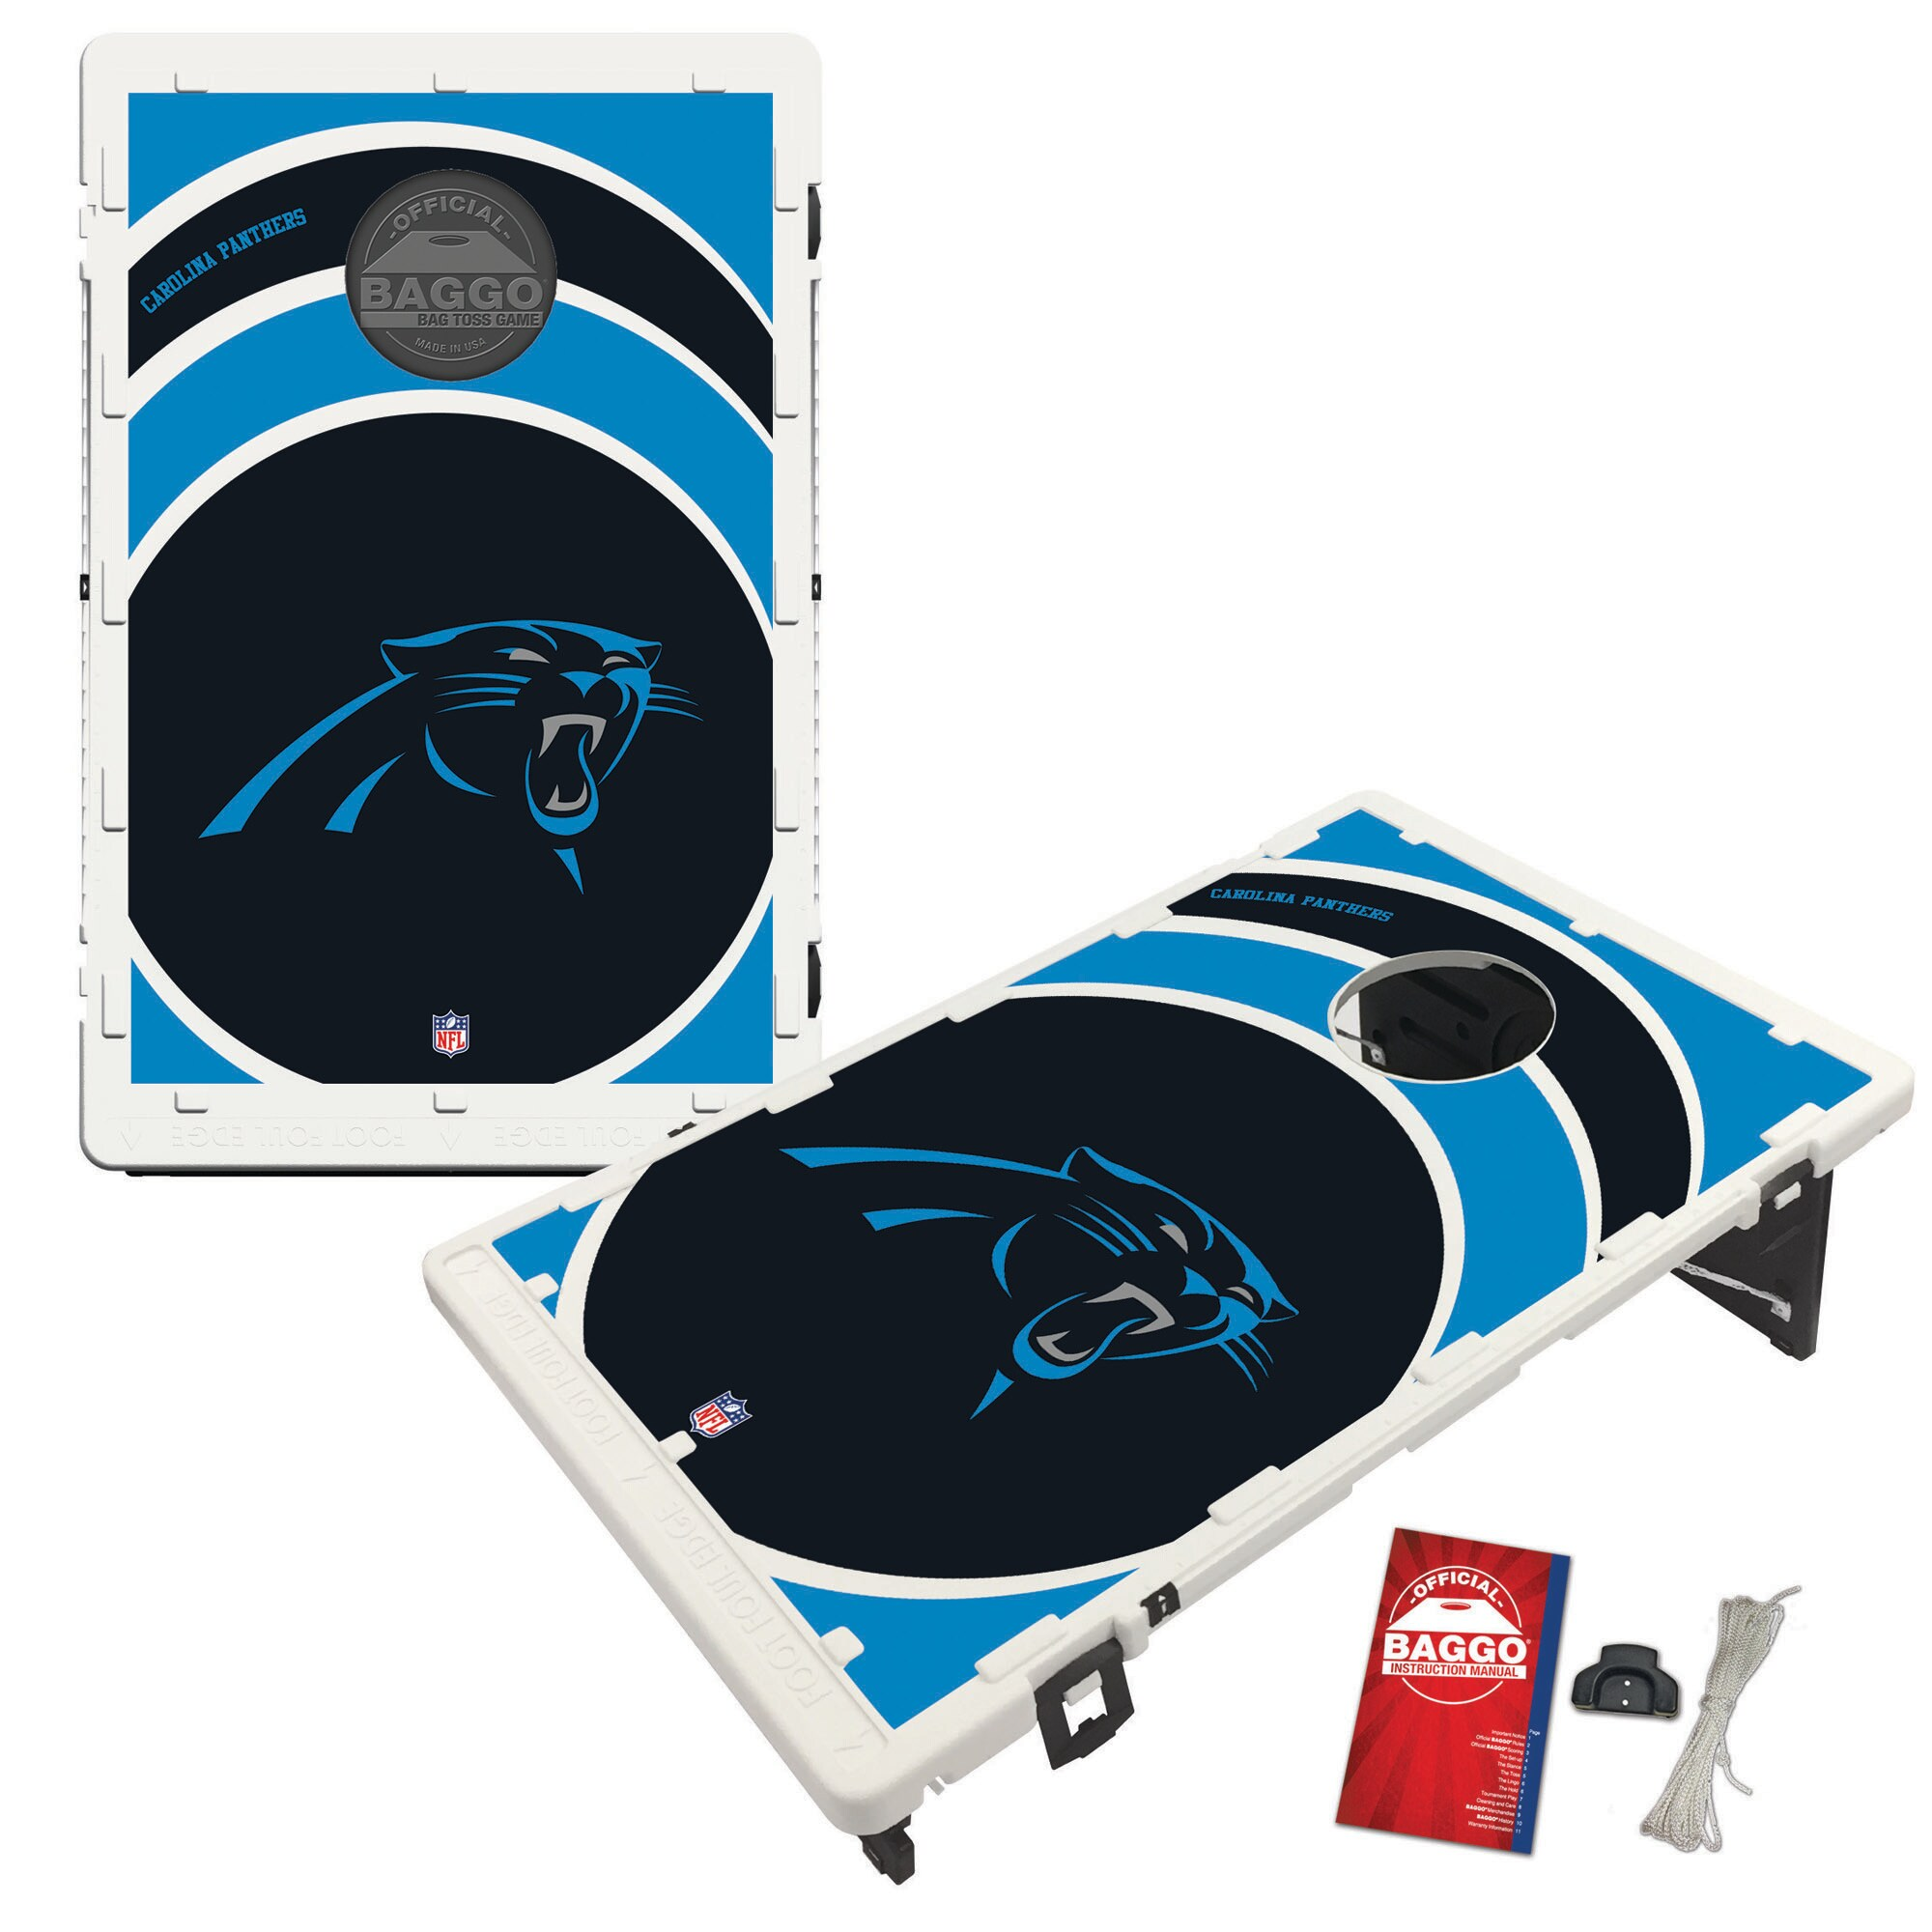 Carolina Panthers 2' x 3' BAGGO Vortex Cornhole Board Tailgate Toss Set